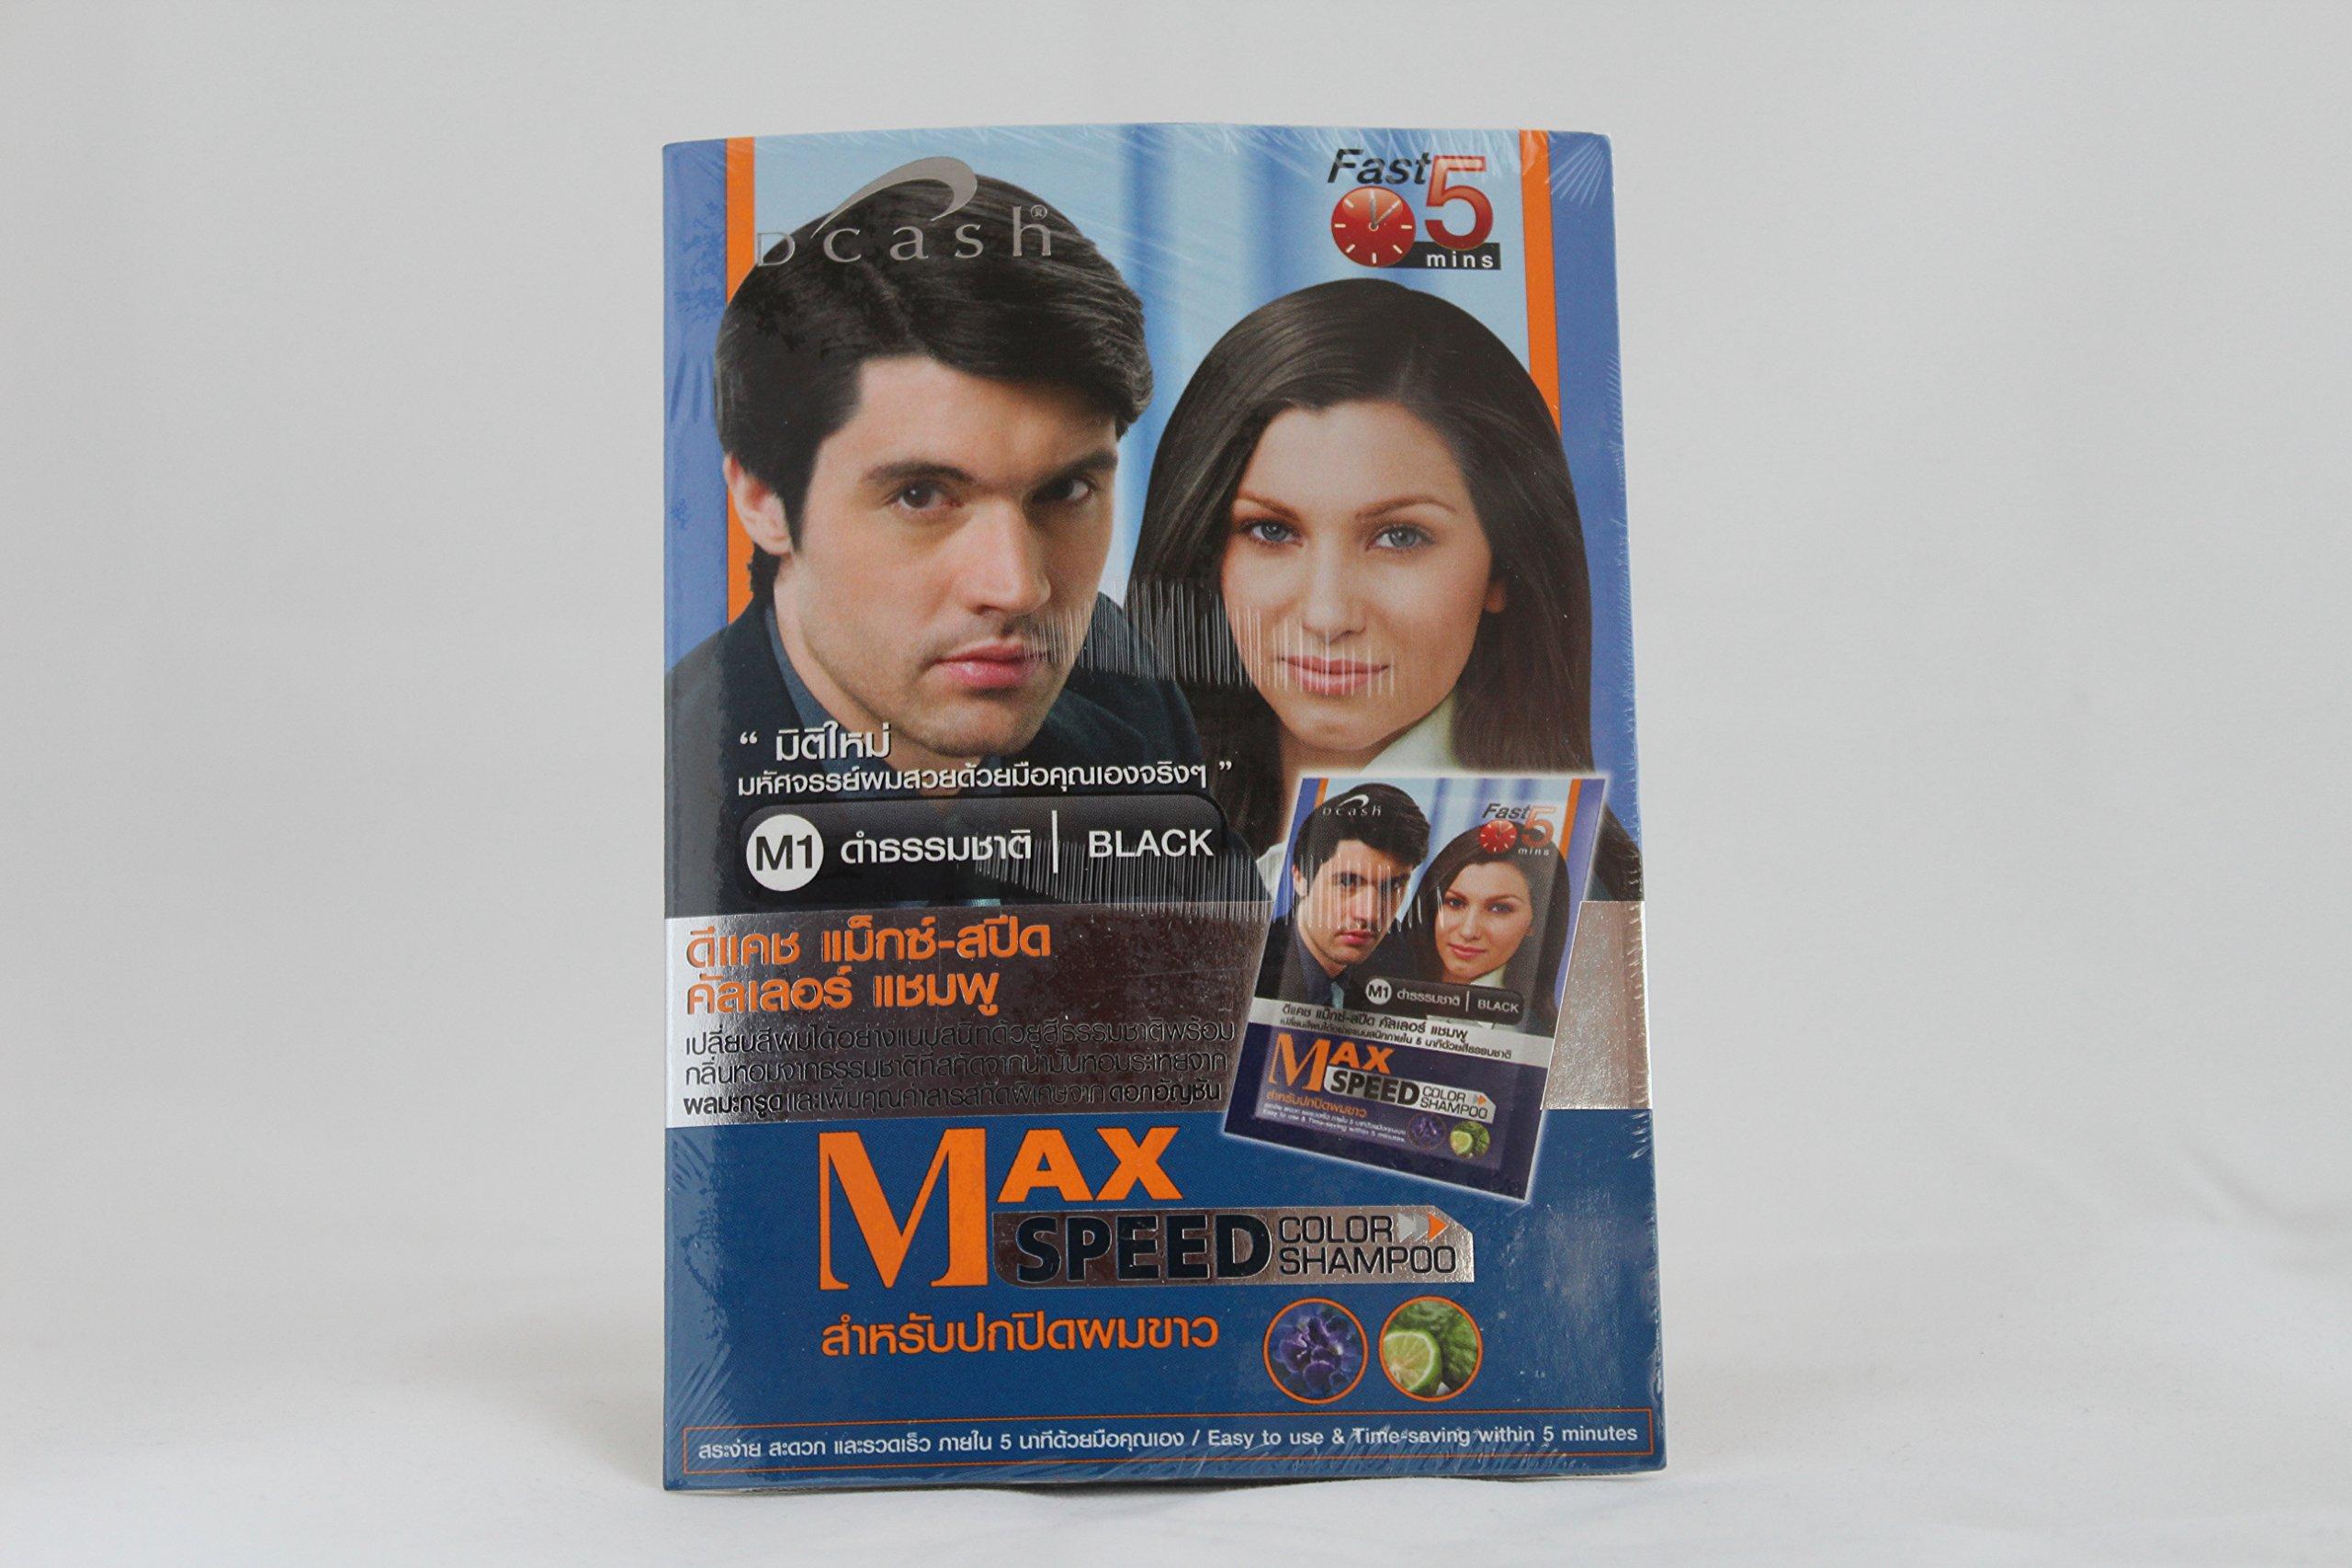 Dcash Max Speed Color Shampoo Black 0.68 Oz Fast in 5 Mins